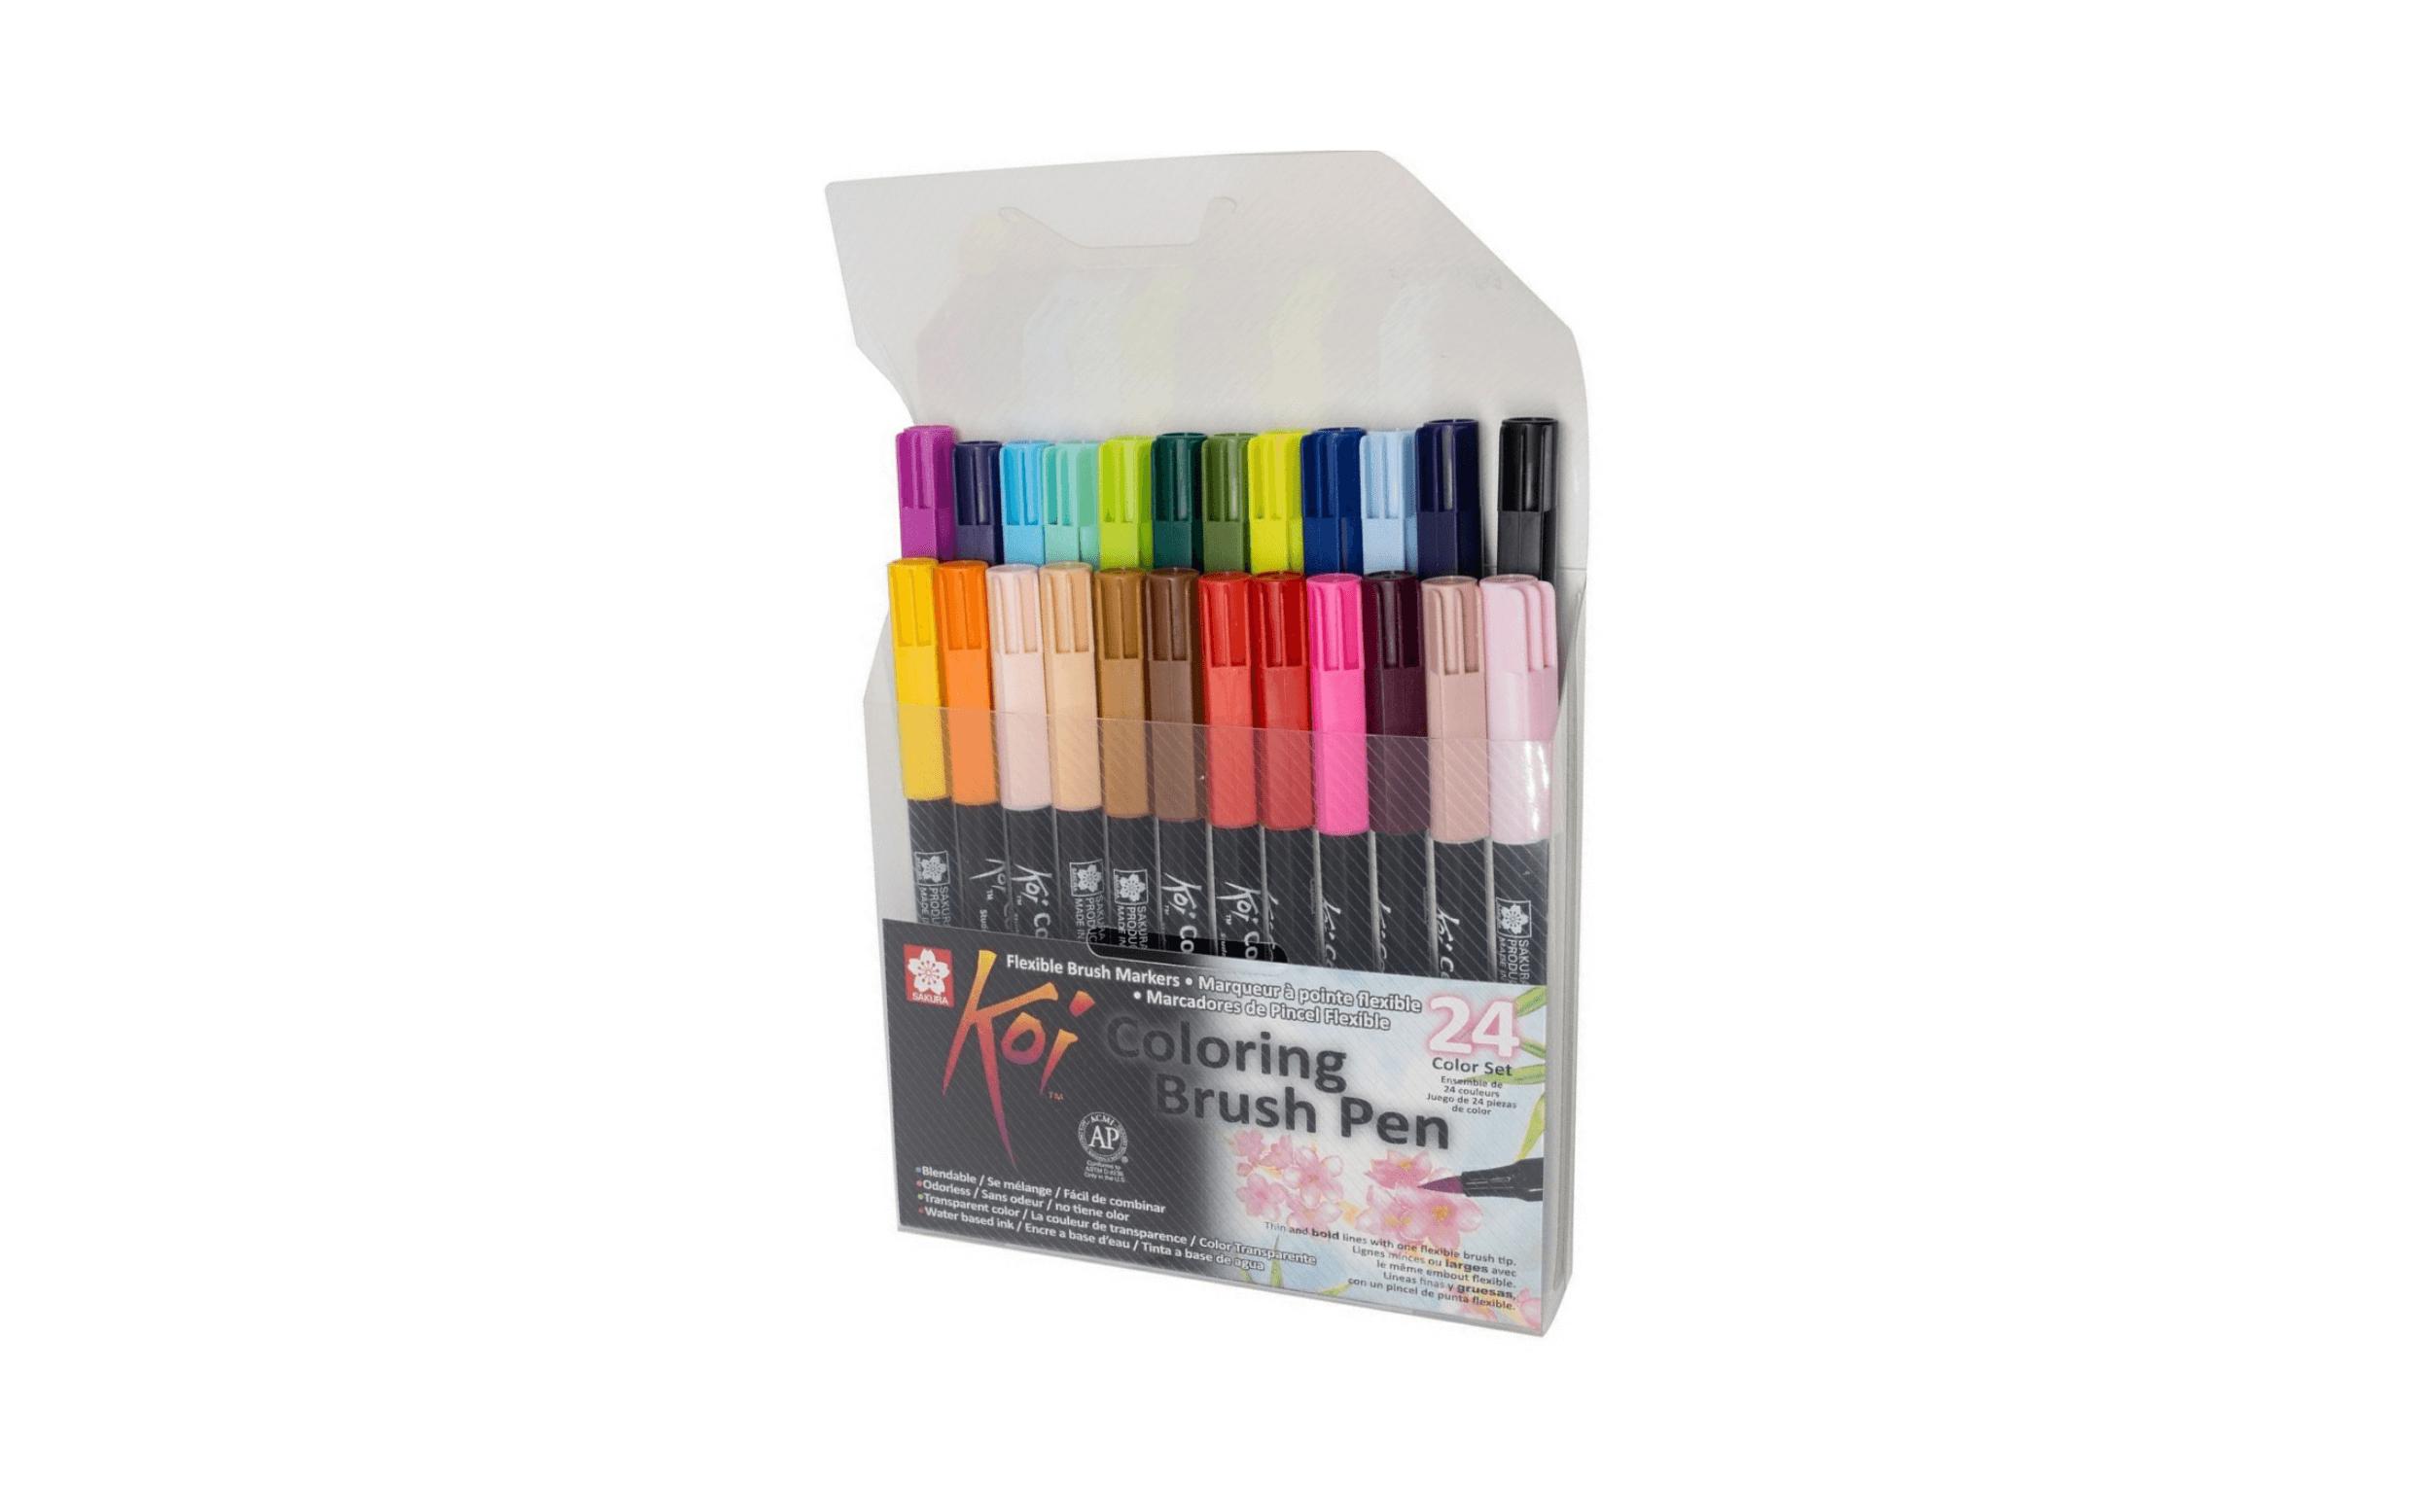 Sakura Koi Coloring Brush Pen Set (24 Color Set) – Dbassa